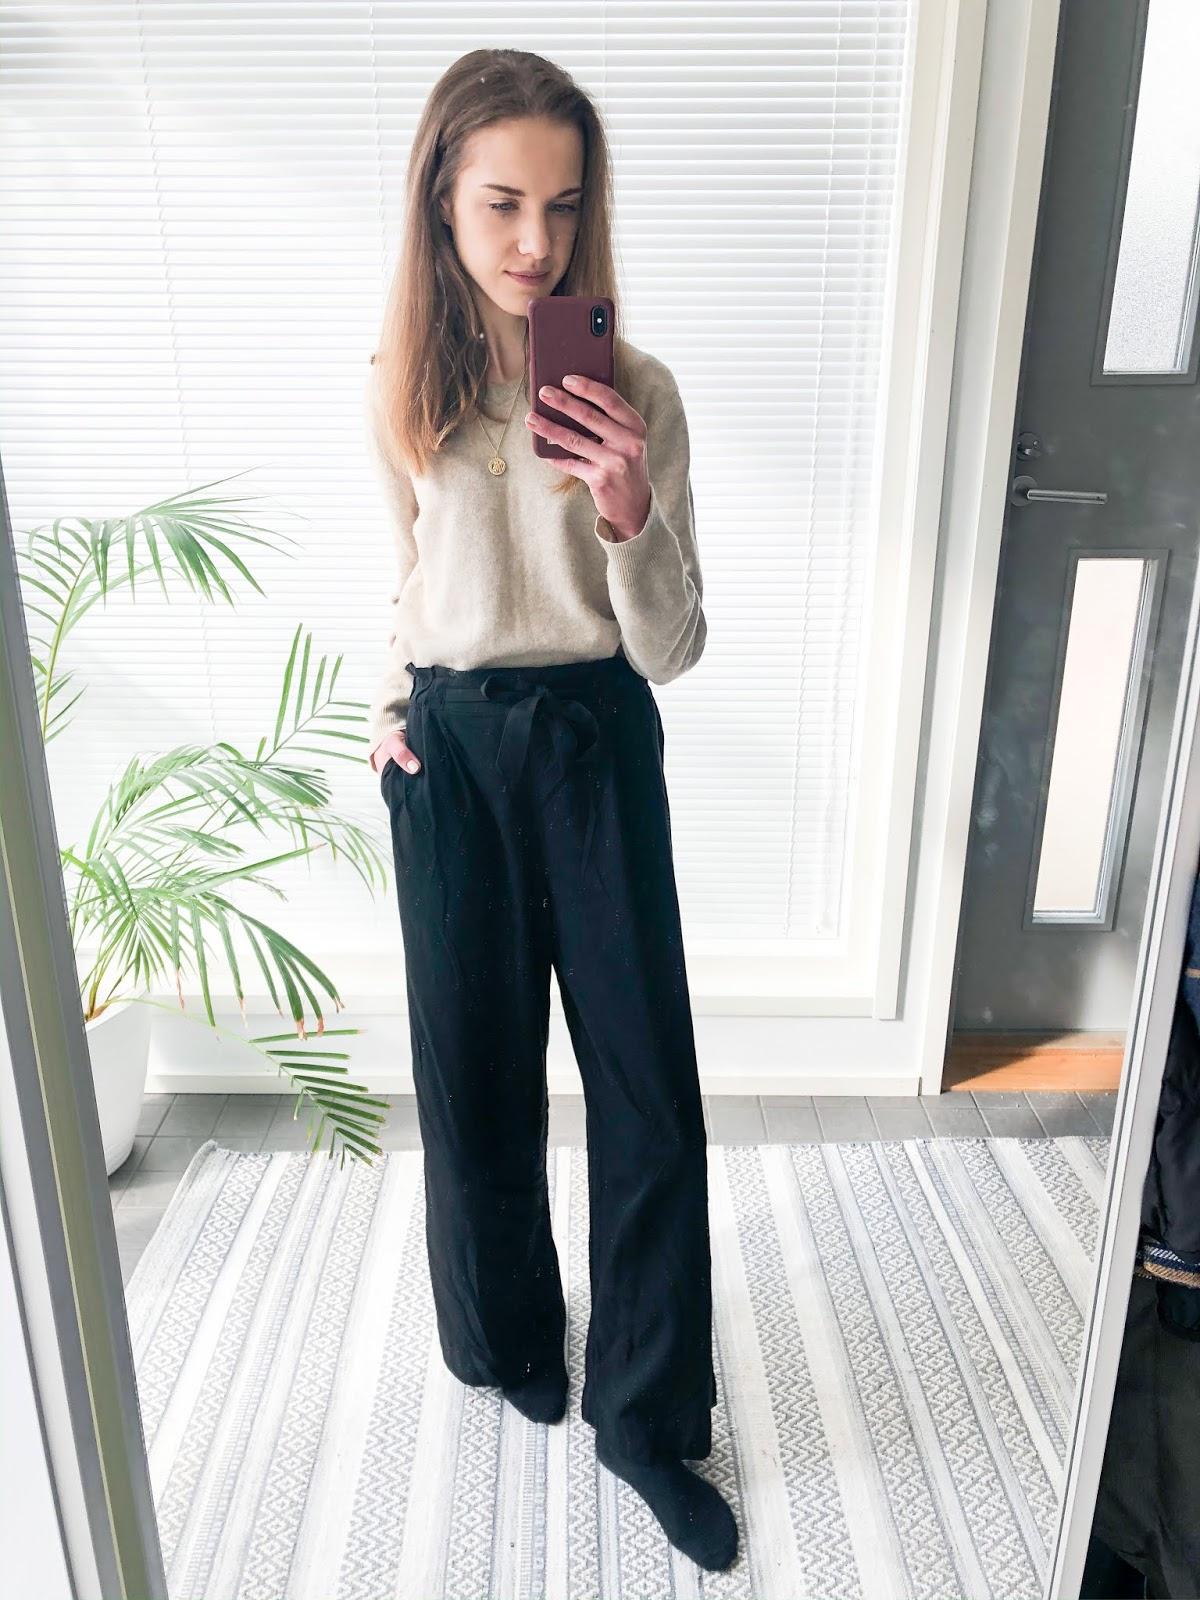 Fashion blogger work from home outfit - Kotitoimisto, asuinspiraatio, muotibloggaaja